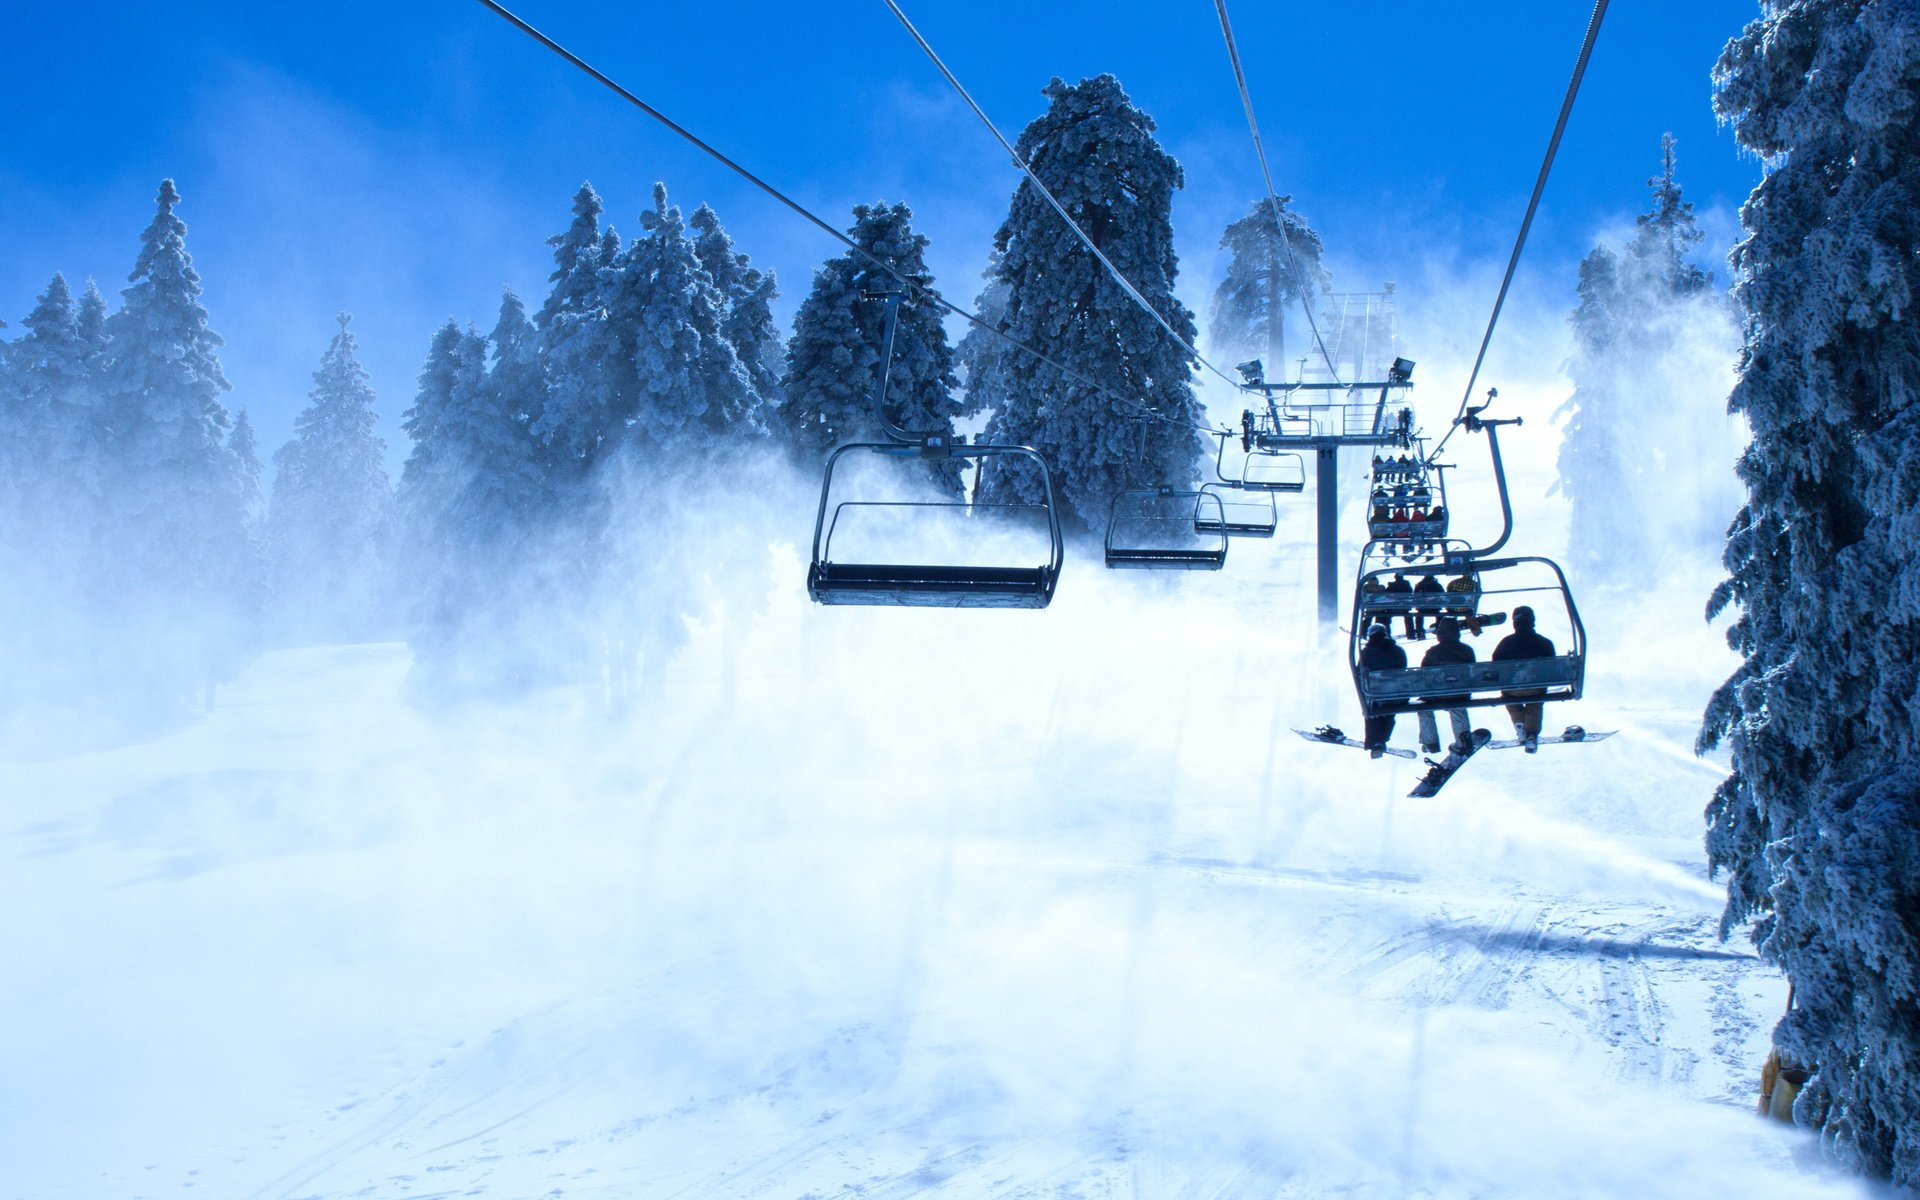 ski lift skiing snowboarding - photo #39